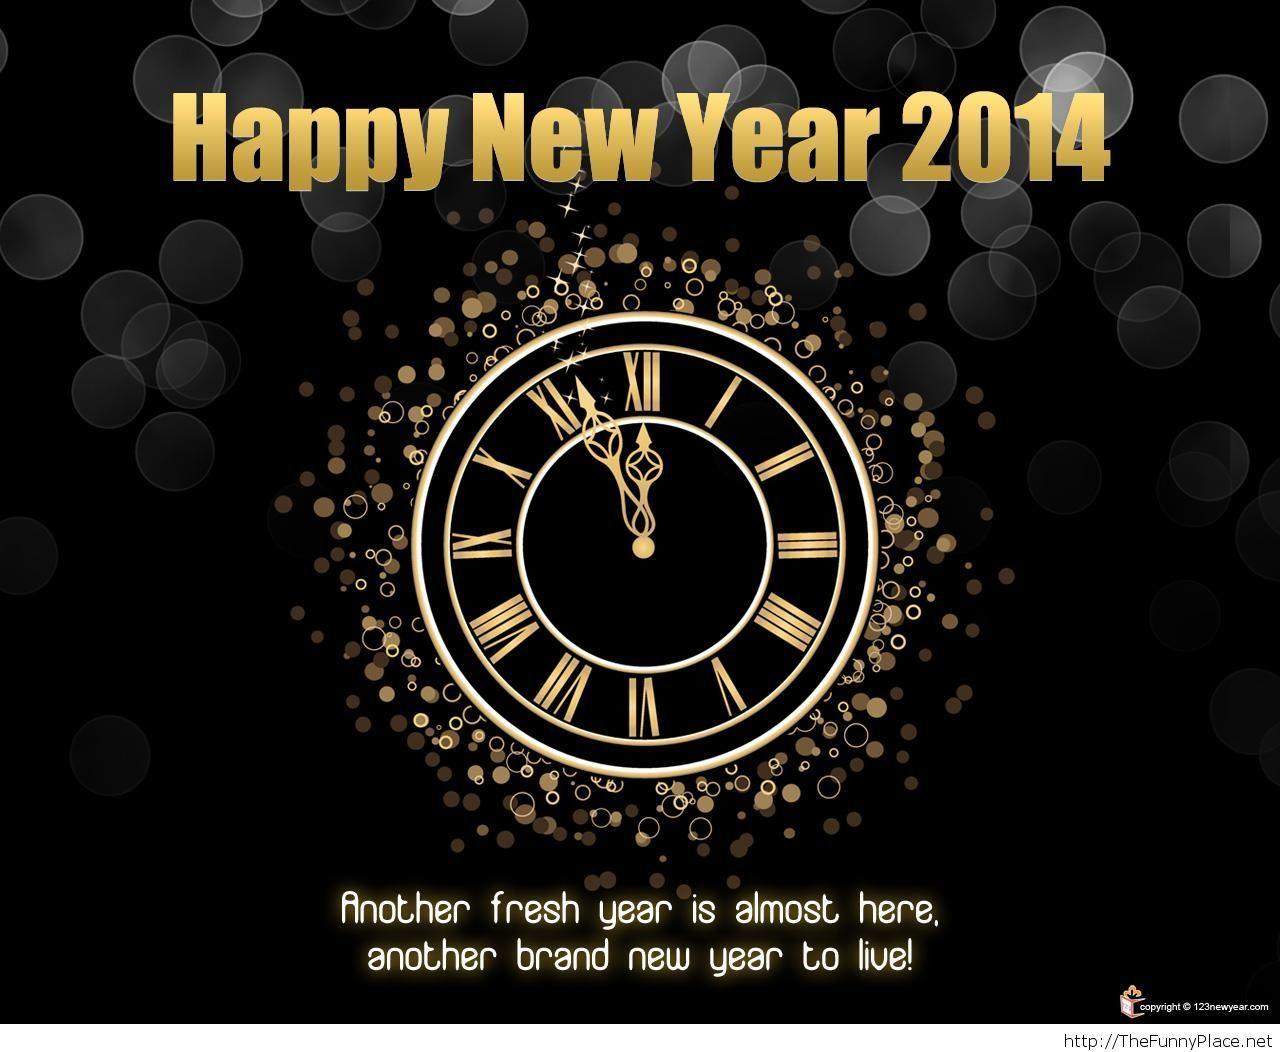 Happy new year 2014 new quote